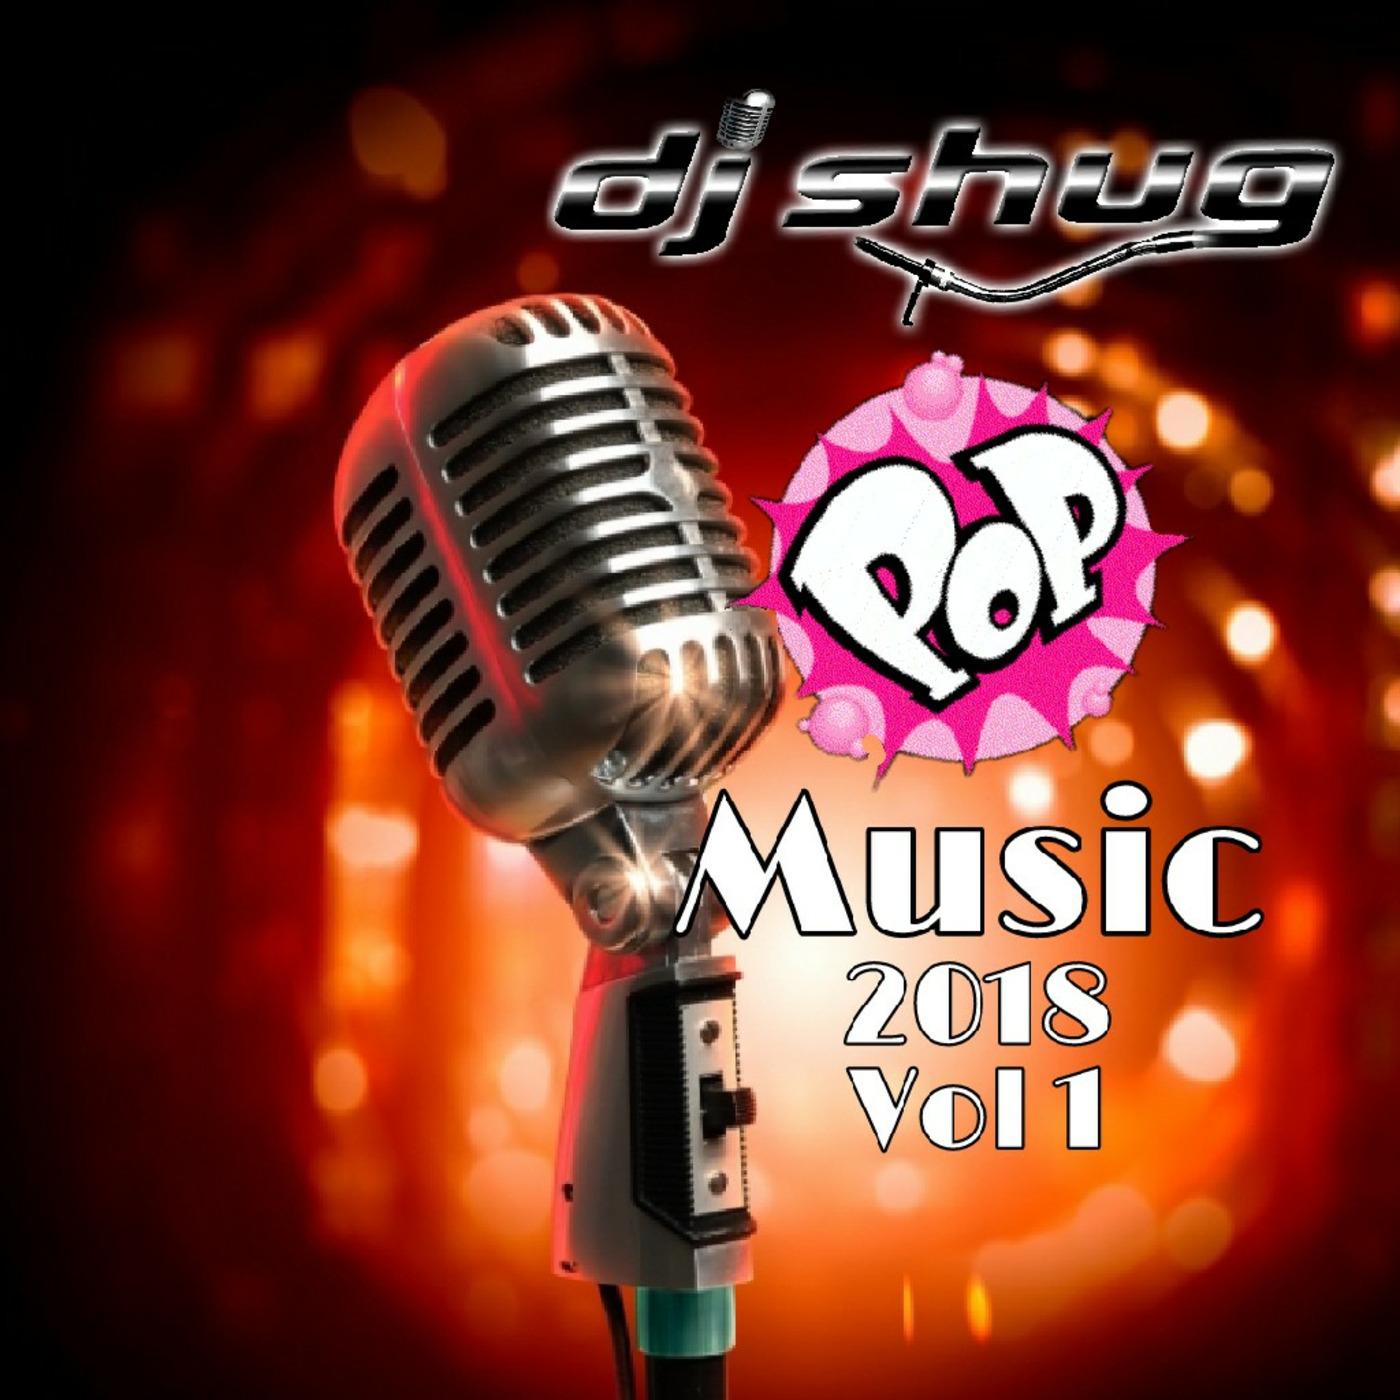 DJ Shug POP! Music 2018 V1 DJ SHUG's podcast